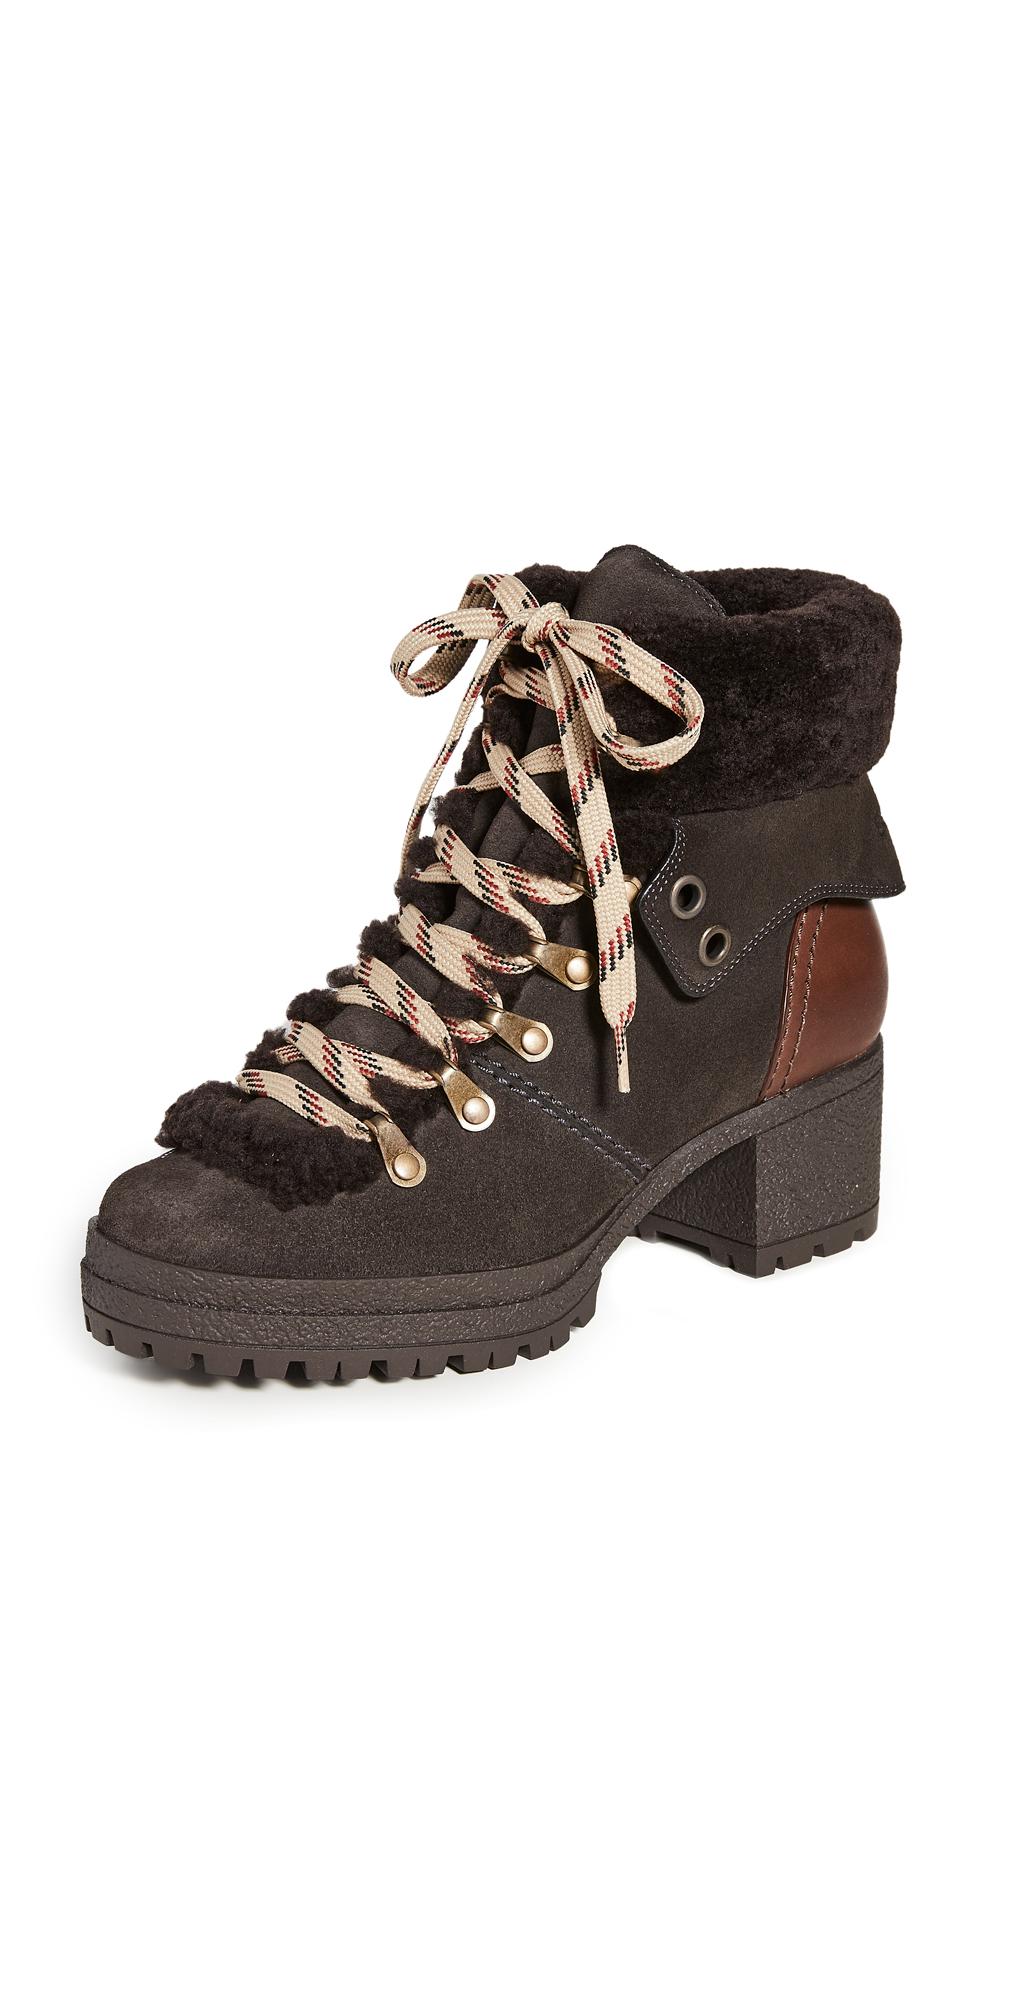 See by Chloe Eileen Block Heel Ankle Boots